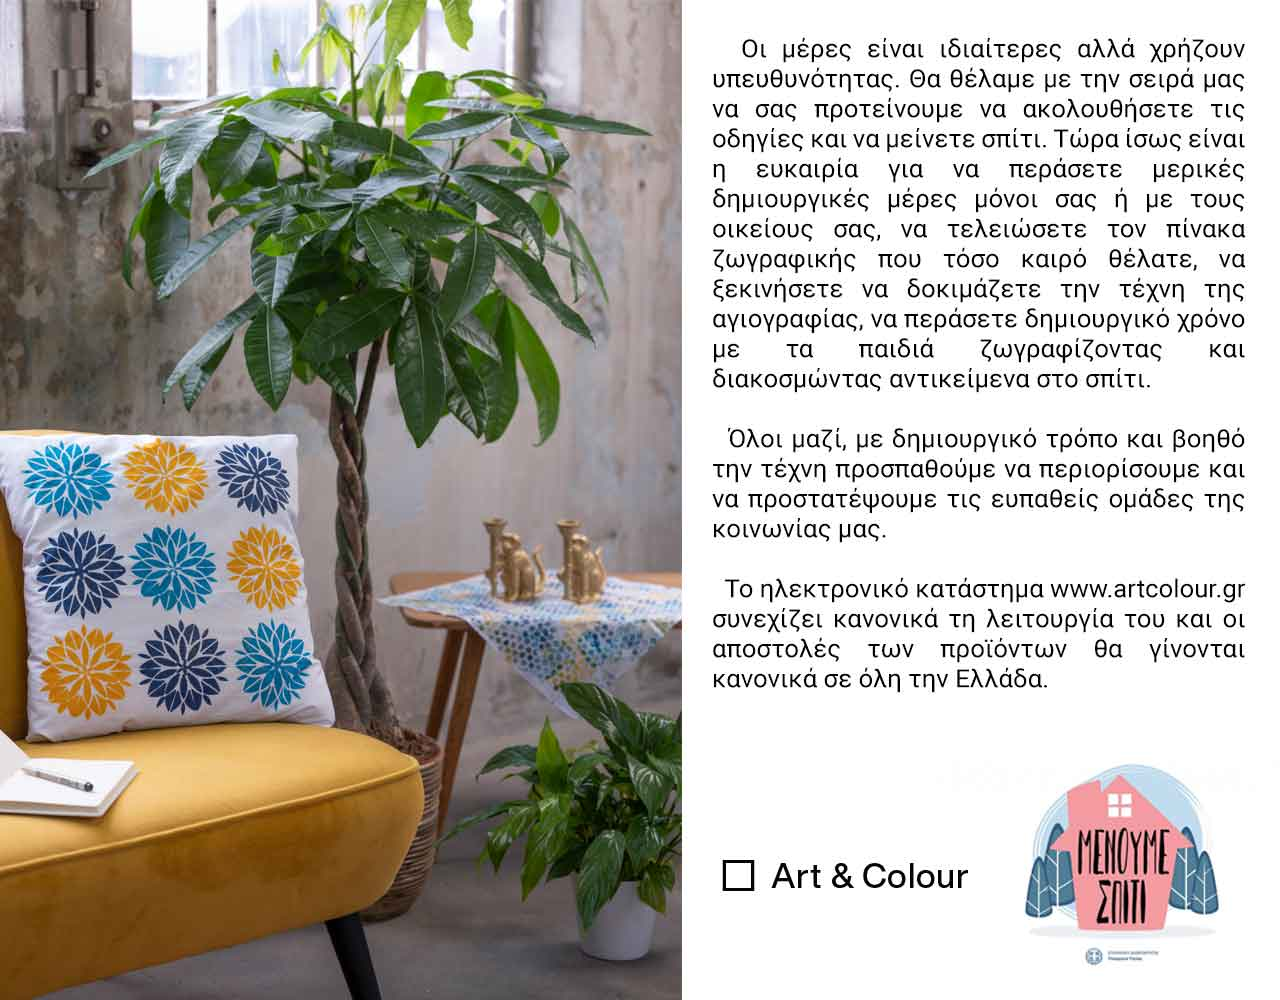 menoume-spiti-banner-art&colour